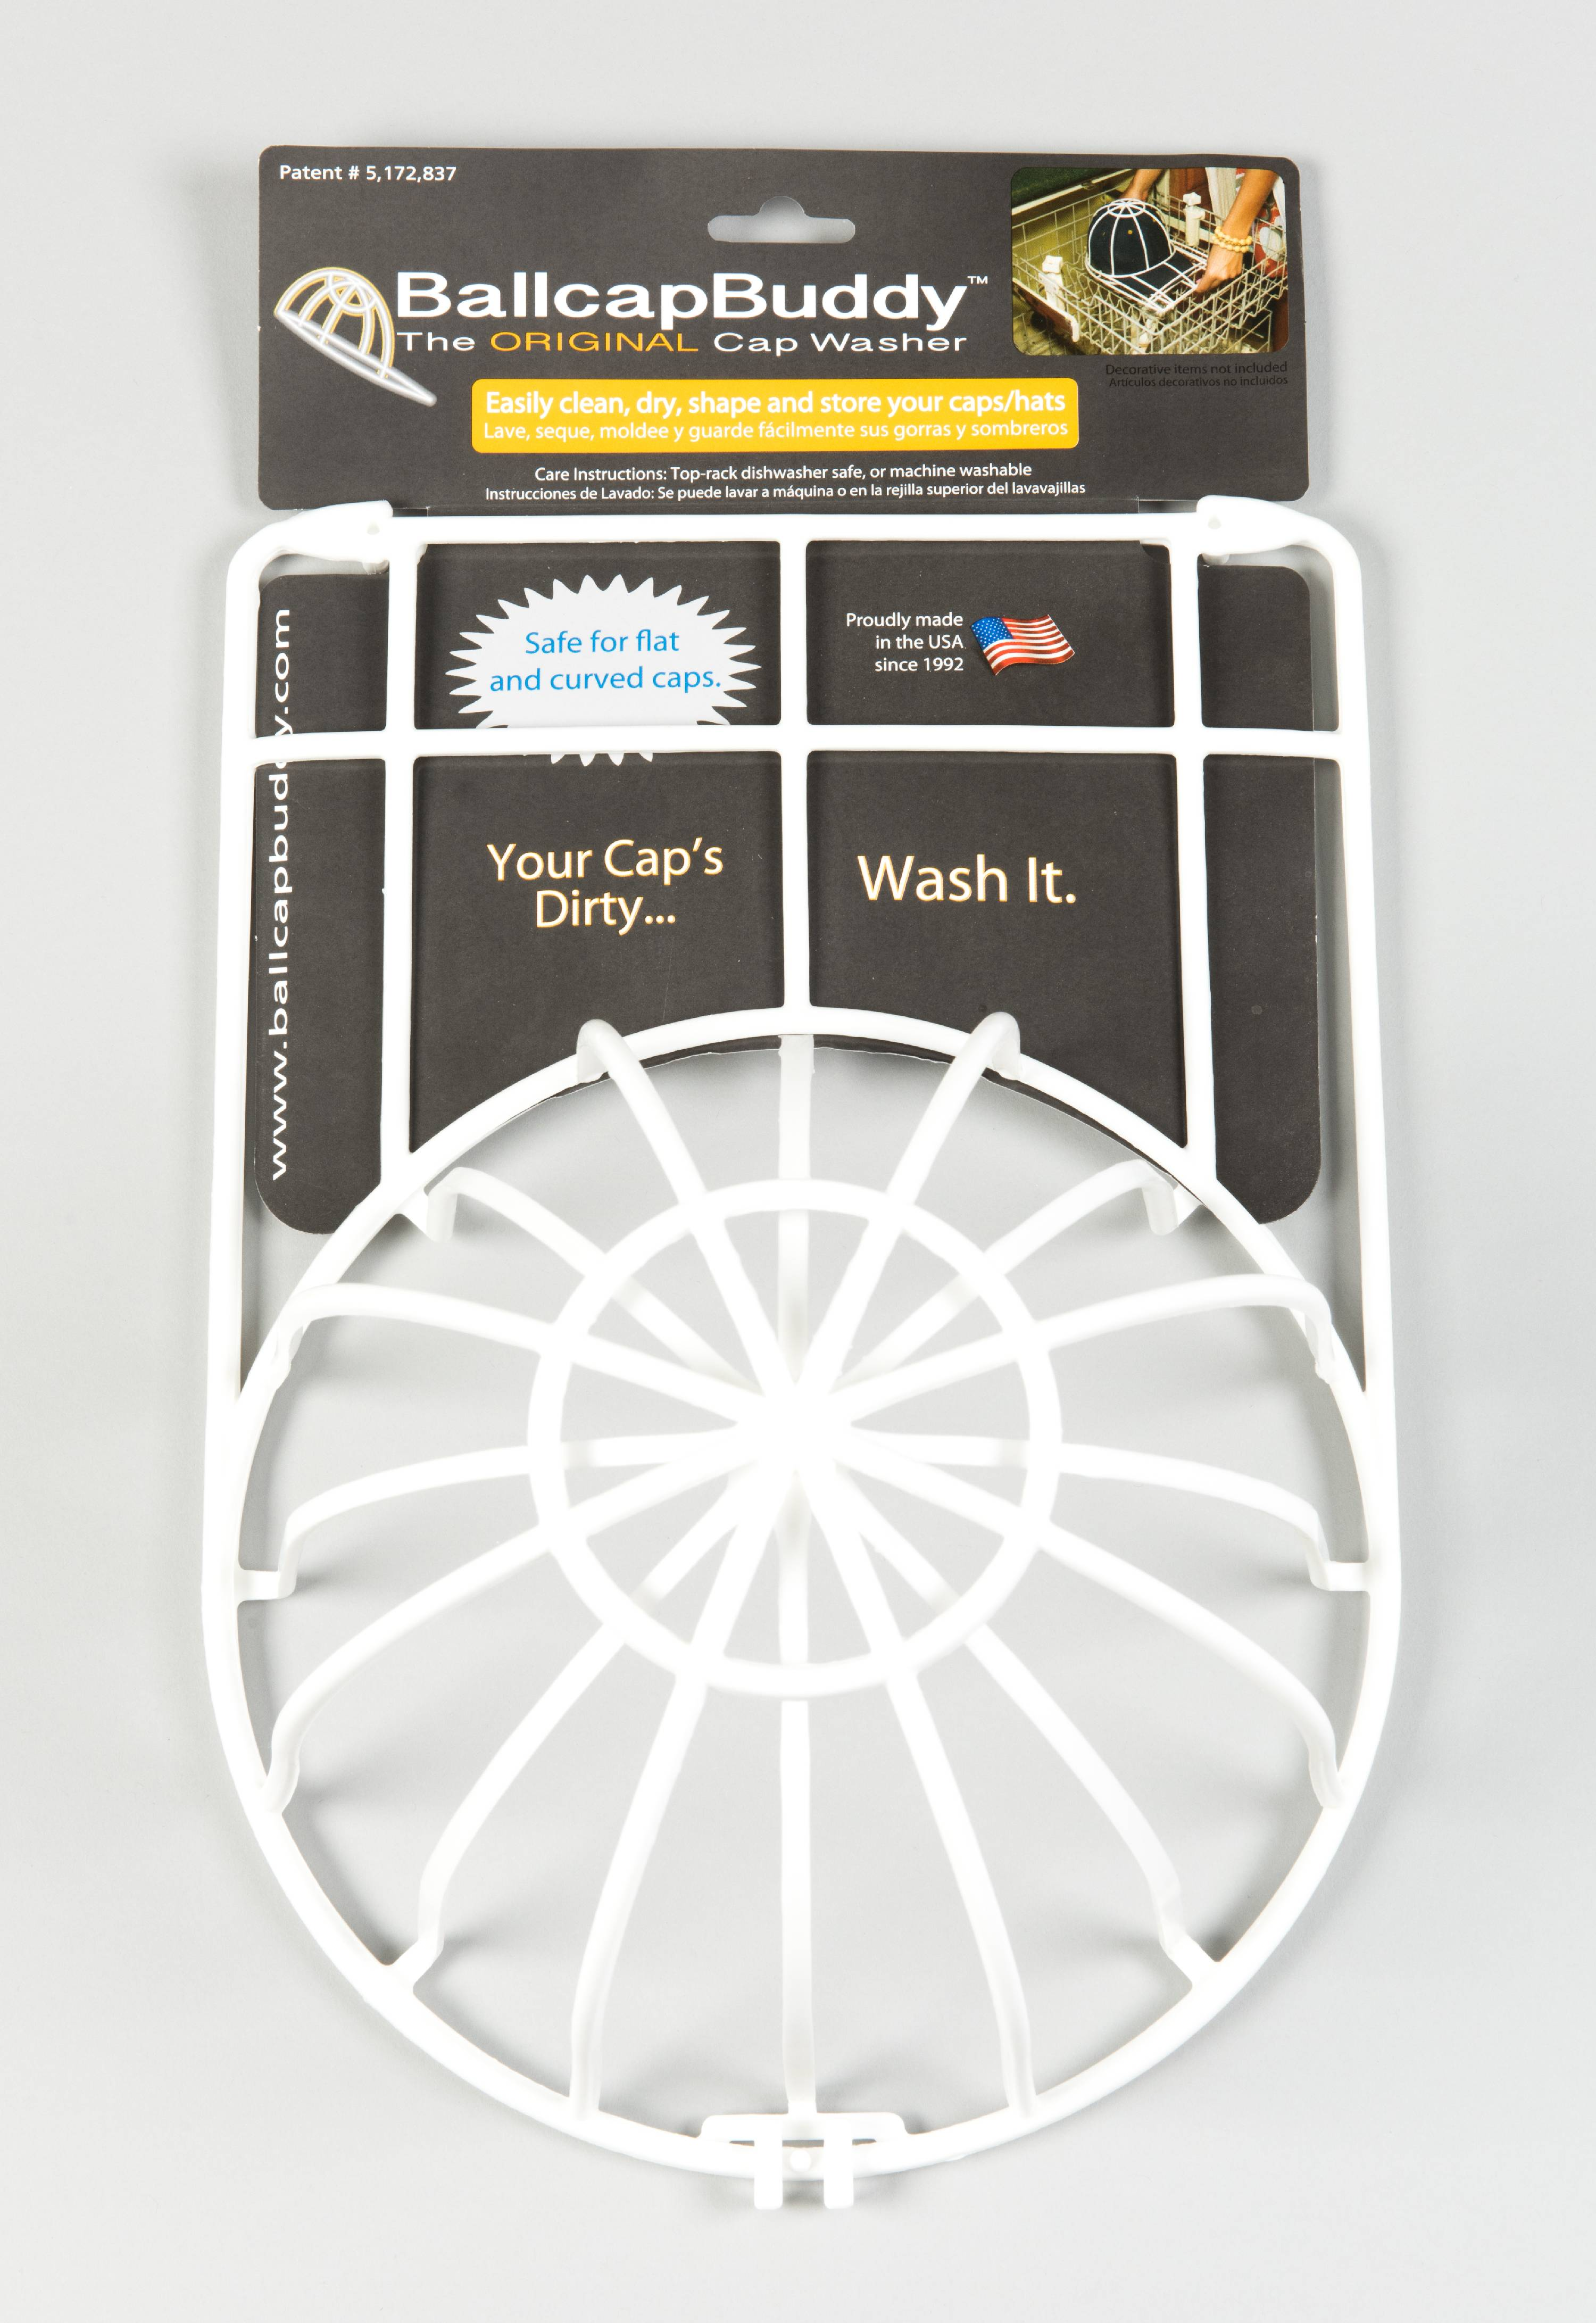 Ballcap Buddy Cap Washer endorsed by SHARK TANK the Original ...